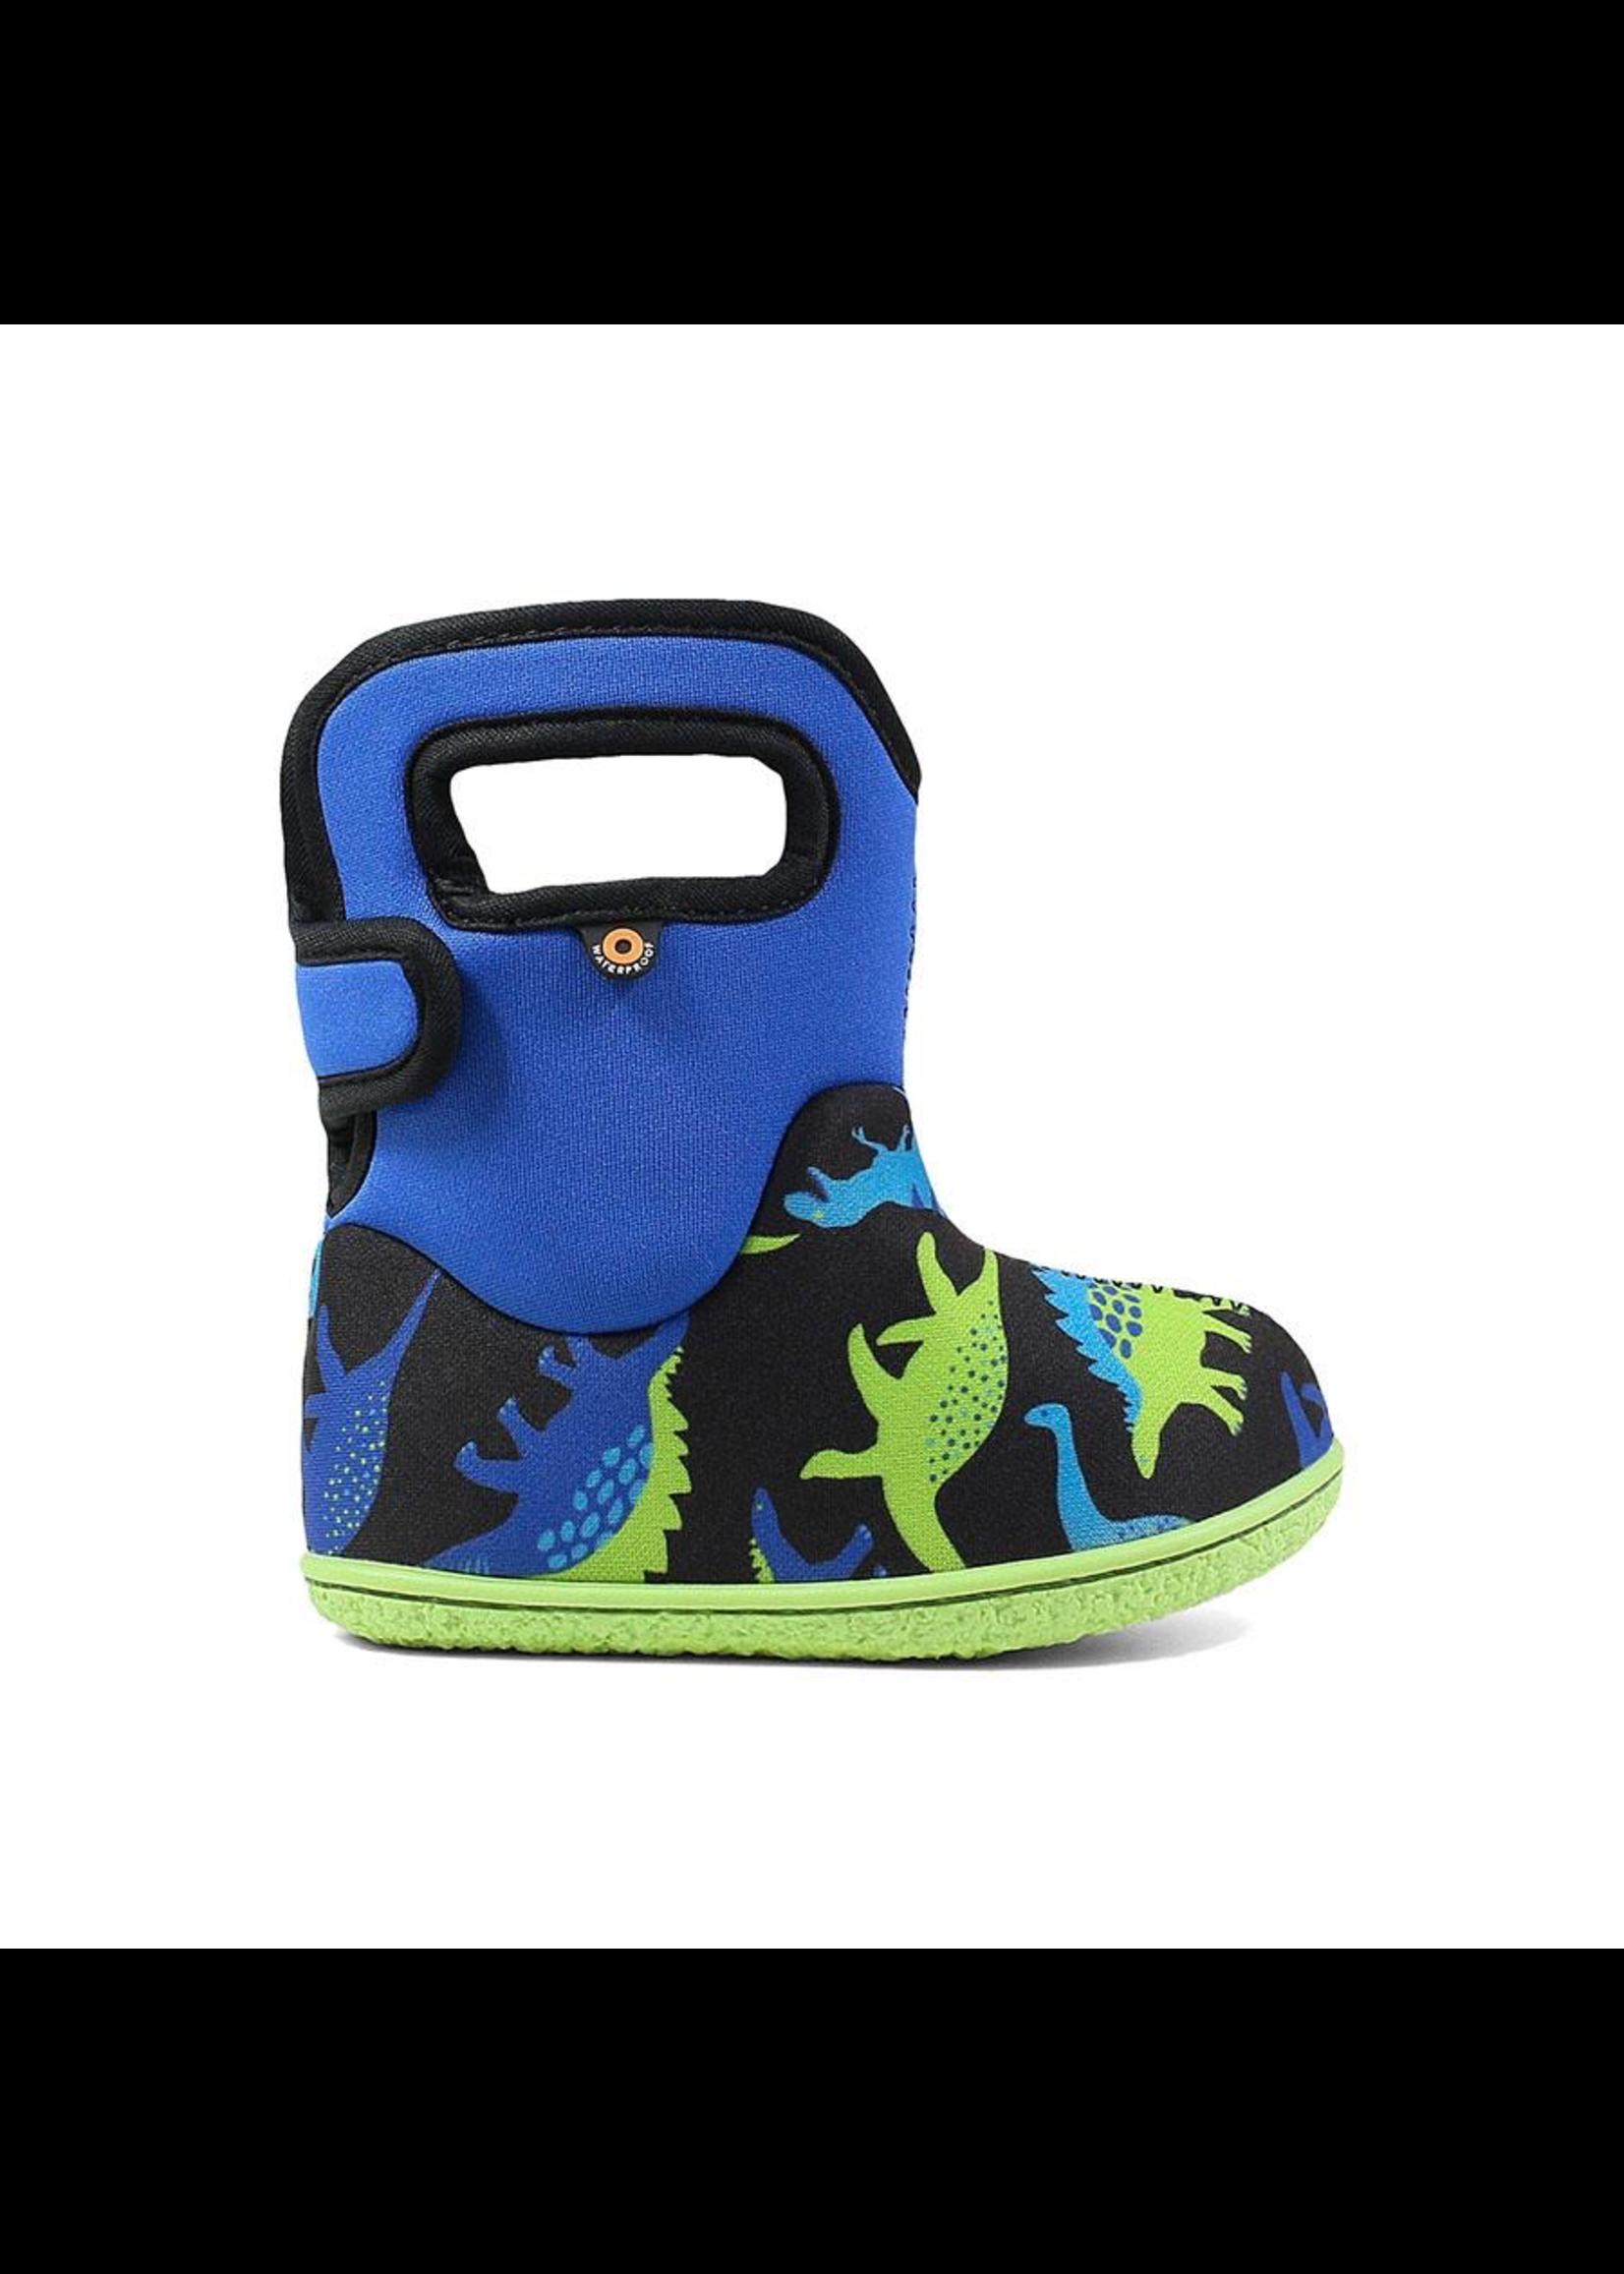 Bogs Bogs, Baby Bogs Dino Waterproof Boots - P-63028